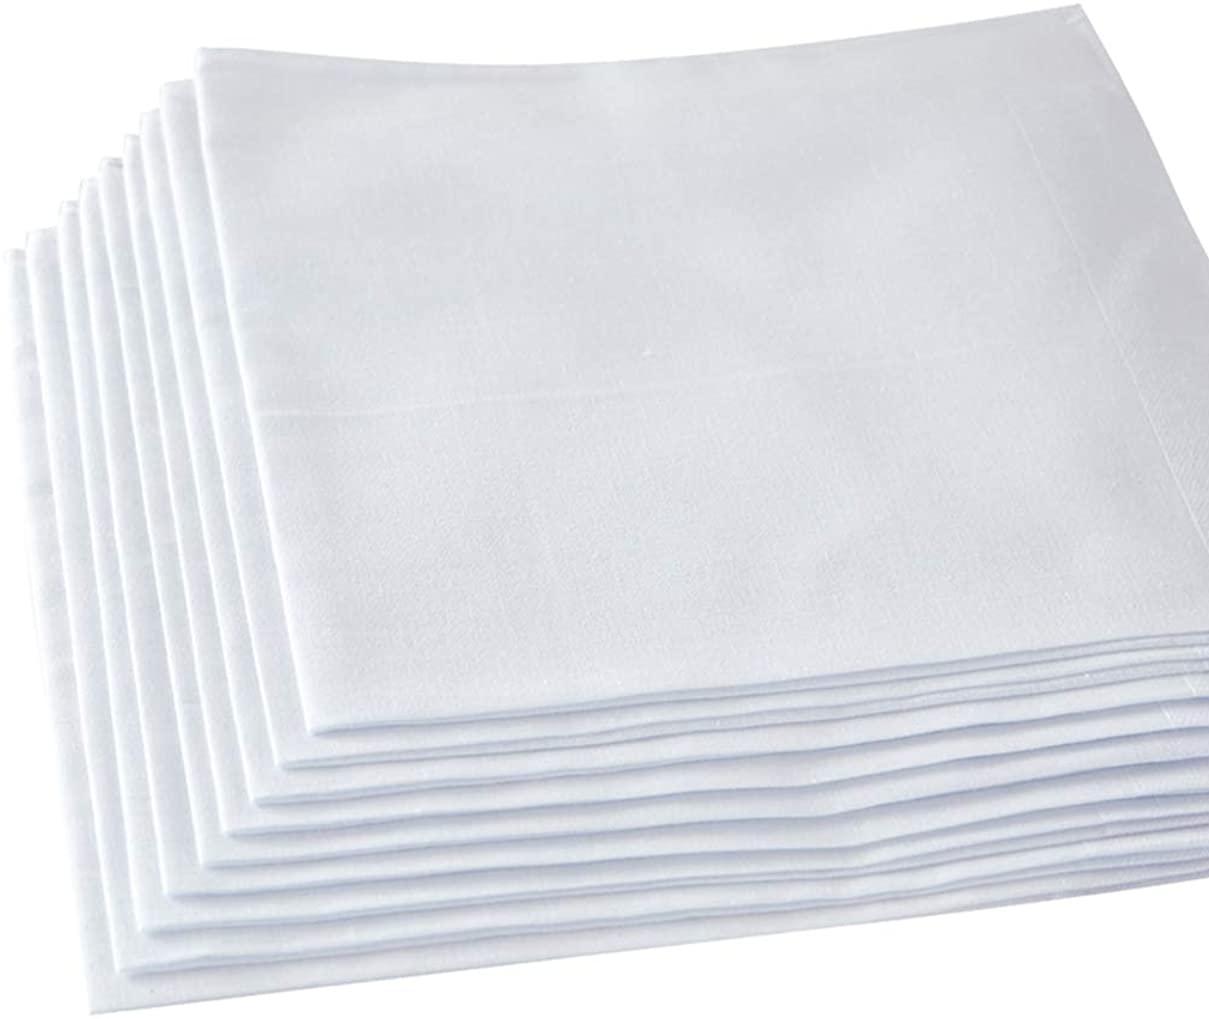 Ricosky Women'sLadies Pure White Handkerchiefs,12 inch,100% Cotton, Pack of 12